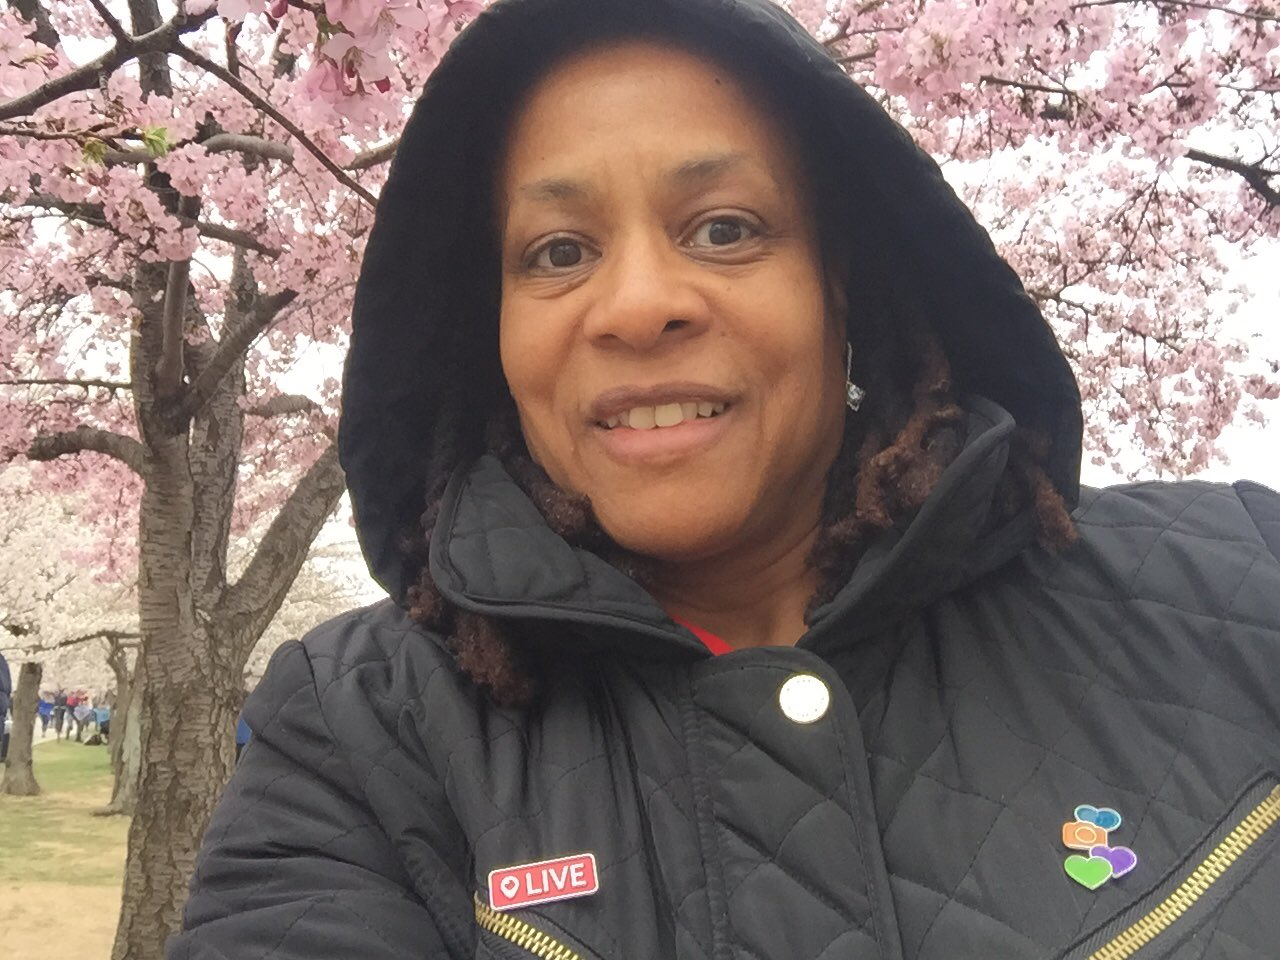 Thumbnail for National Cherry Blossom Festival #WashingtonDC